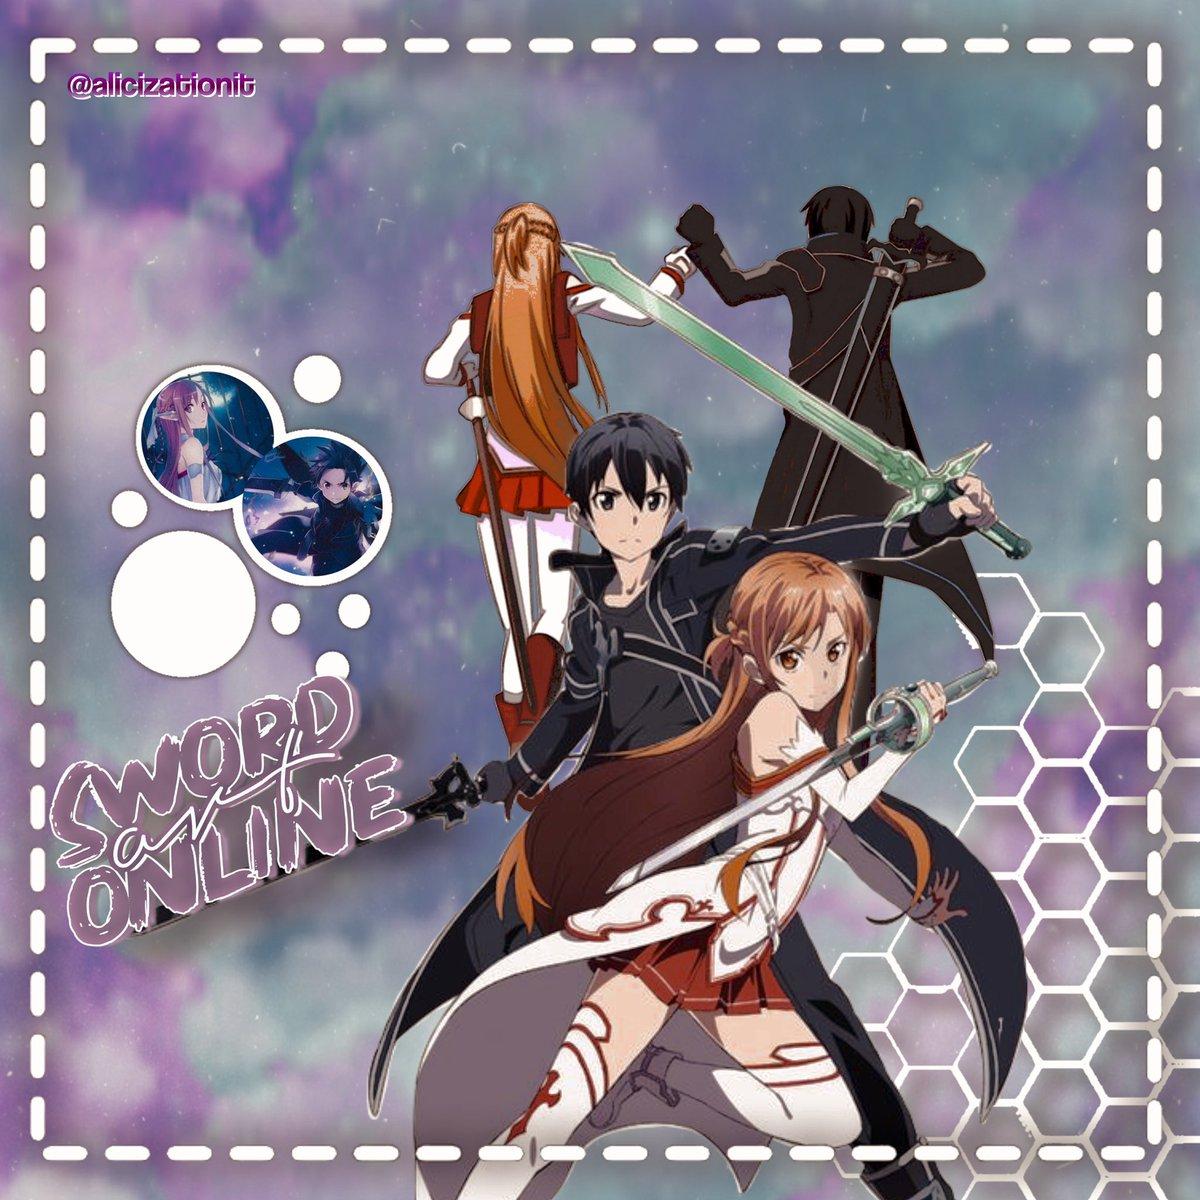 Asuna & Kirito  - - [TAG] #sao #alicization #saoalicization #swordartonline #swordartonlinealicization #saoita #saoanime #alicizationit